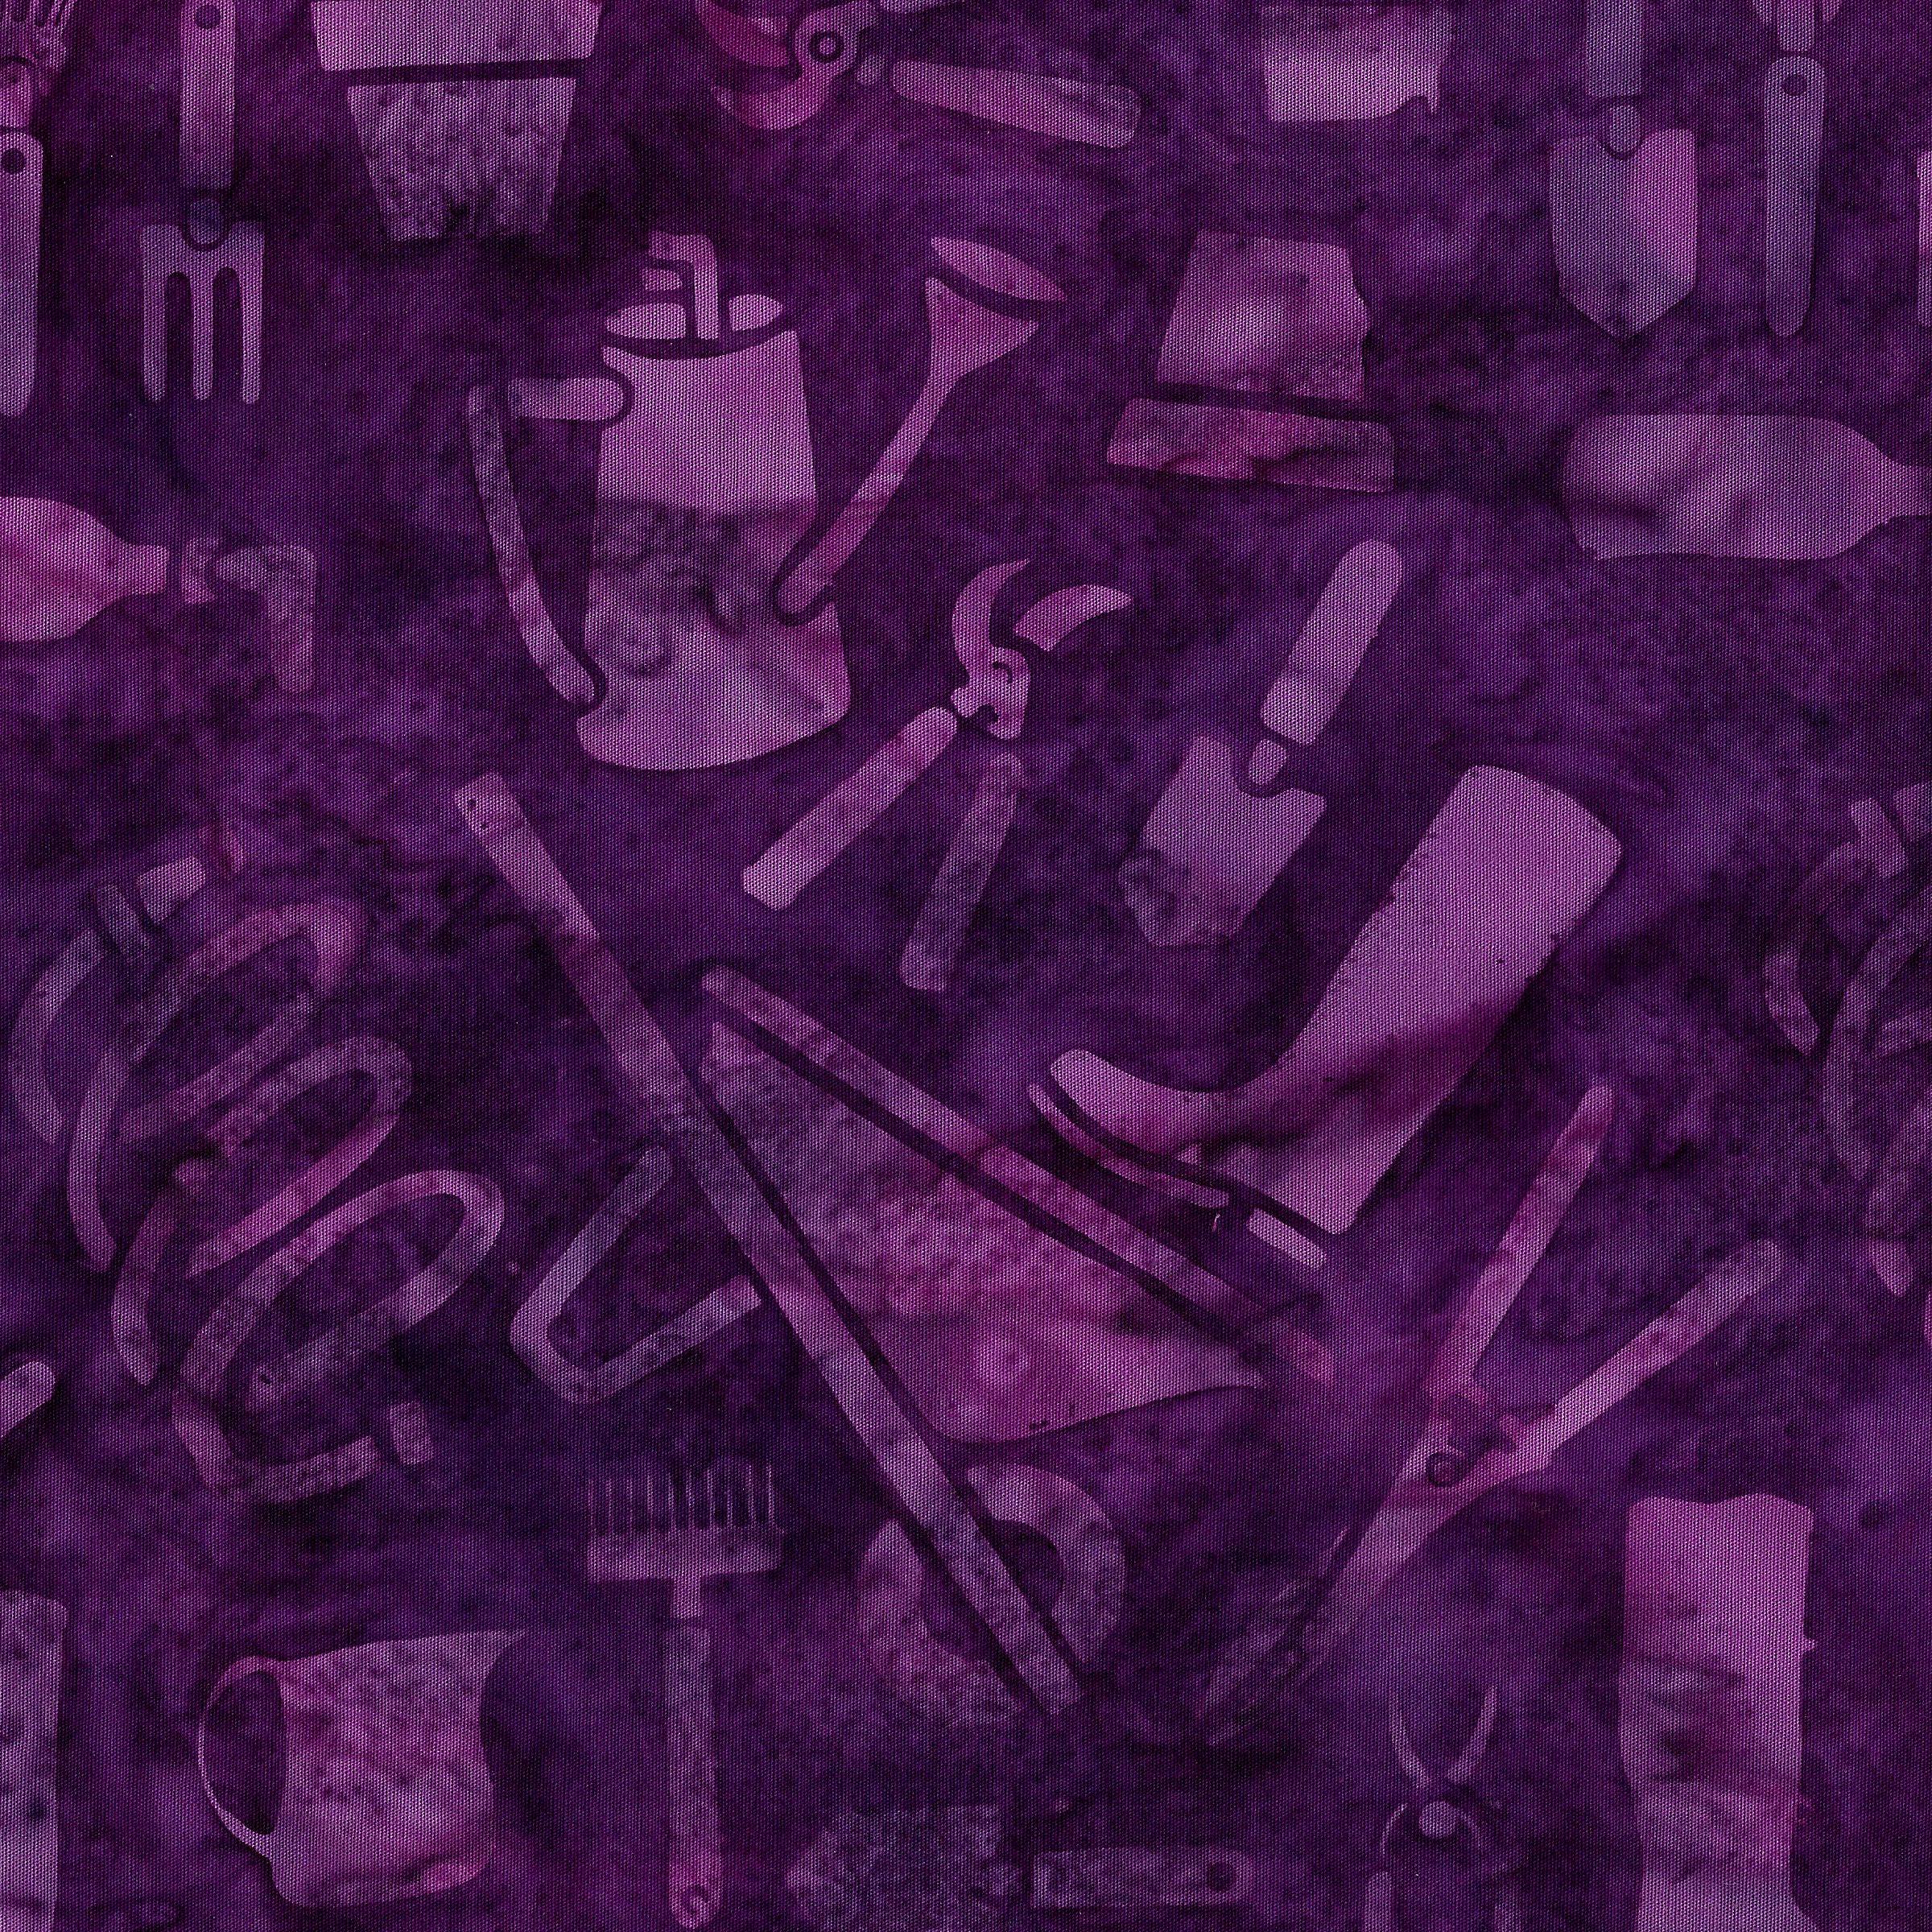 Petal Pushers - Garden Tools, Grape Juice - by Kathy Engle for Island Batik